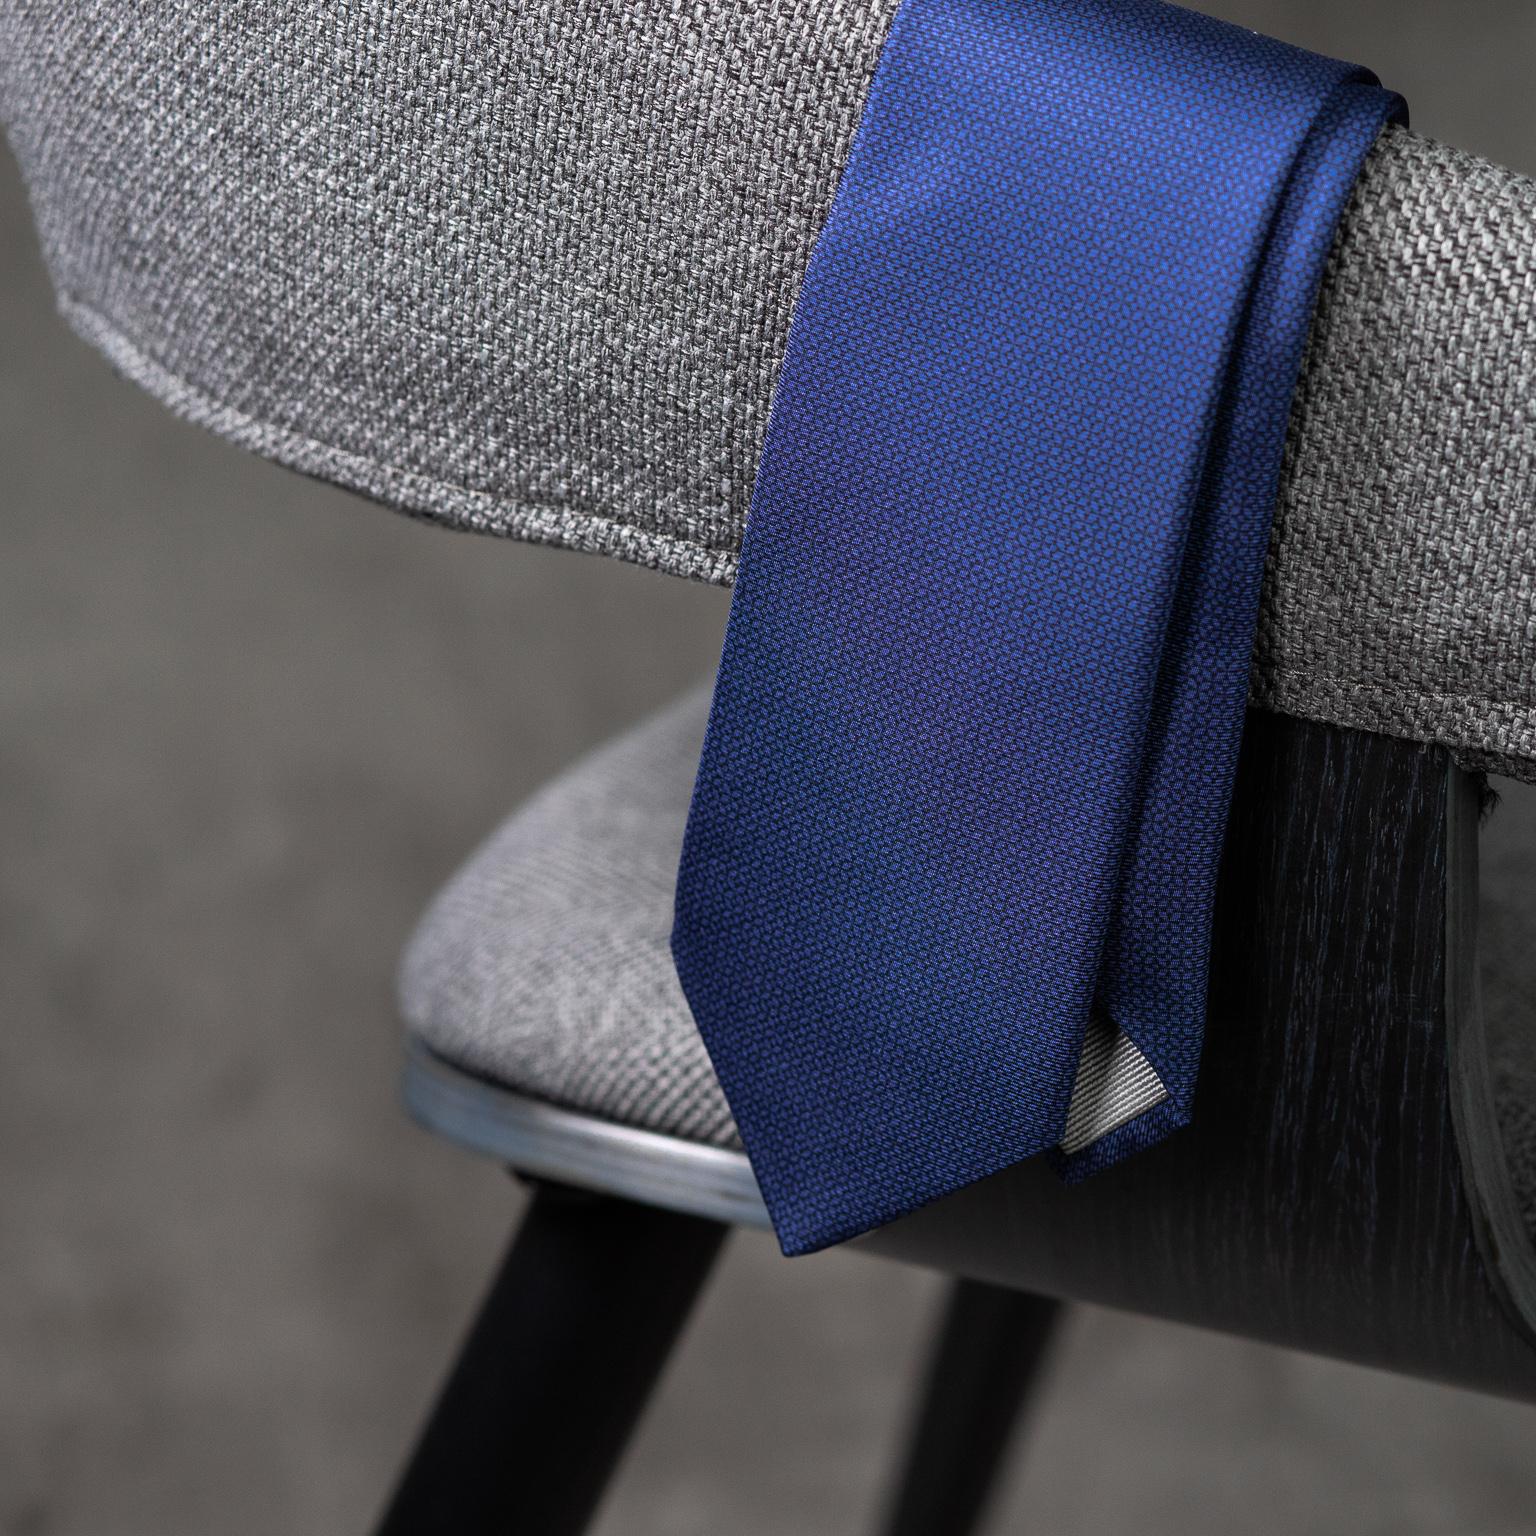 PRINTED-SILK-SEDA-ESTAMPADA-0572-Tie-Initials-Corbata-Iniciales-The-Seëlk-3